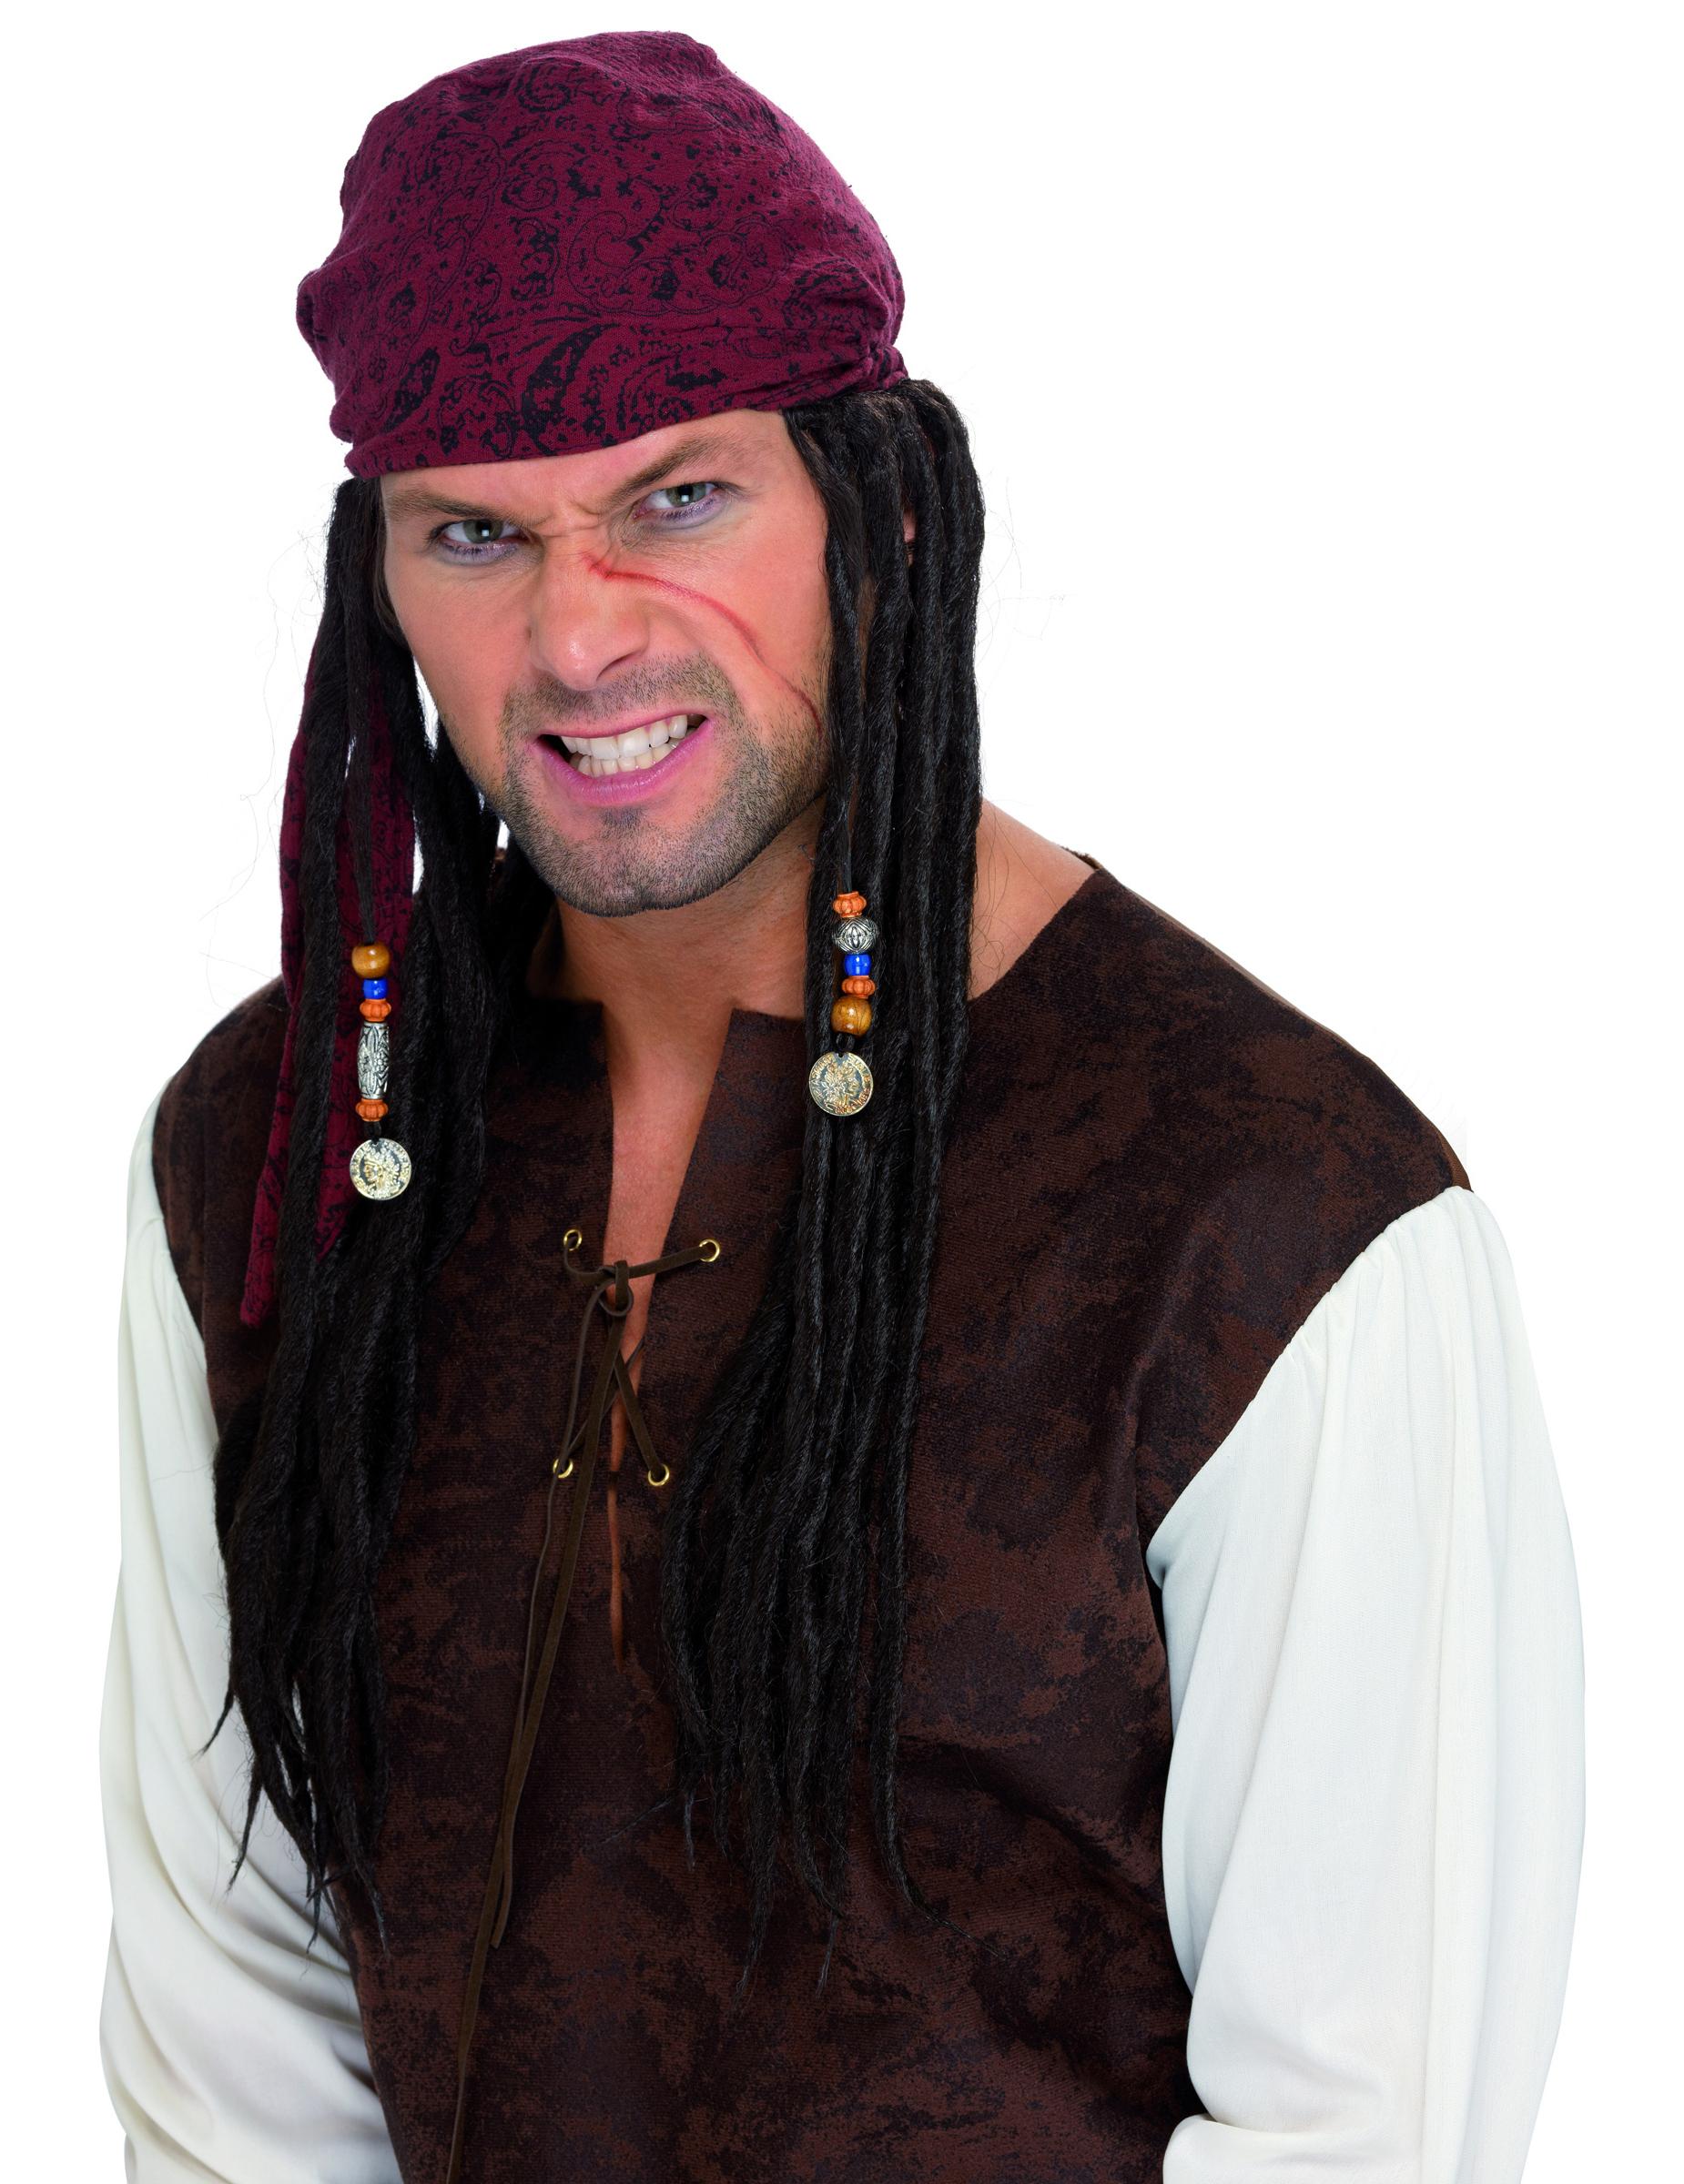 Perruque à dreadlocks style pirate - Deguisetoi